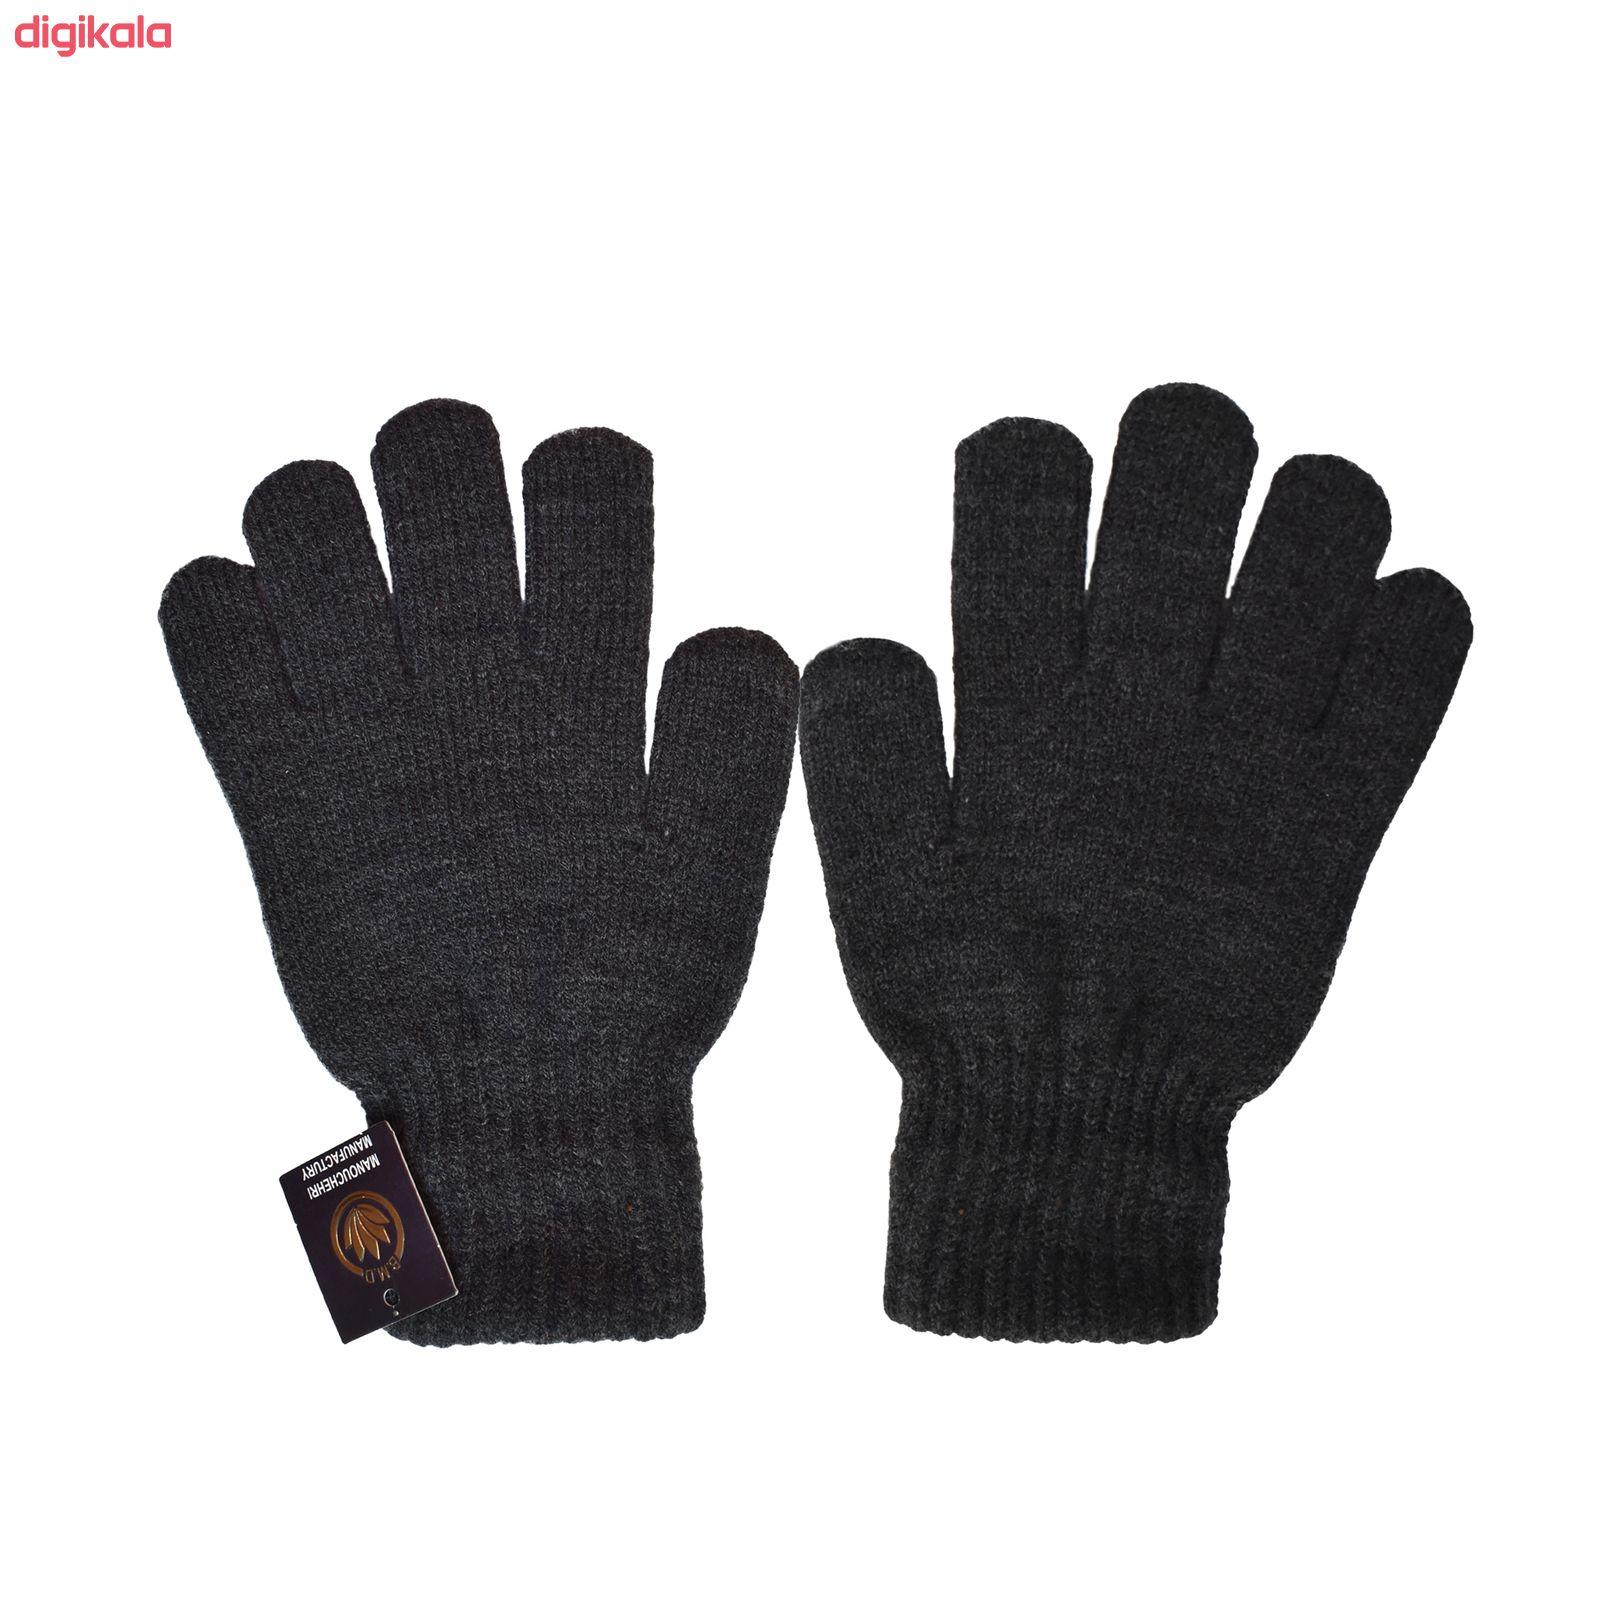 دستکش بافتنی تولیدی منوچهری کد uit56 main 1 1